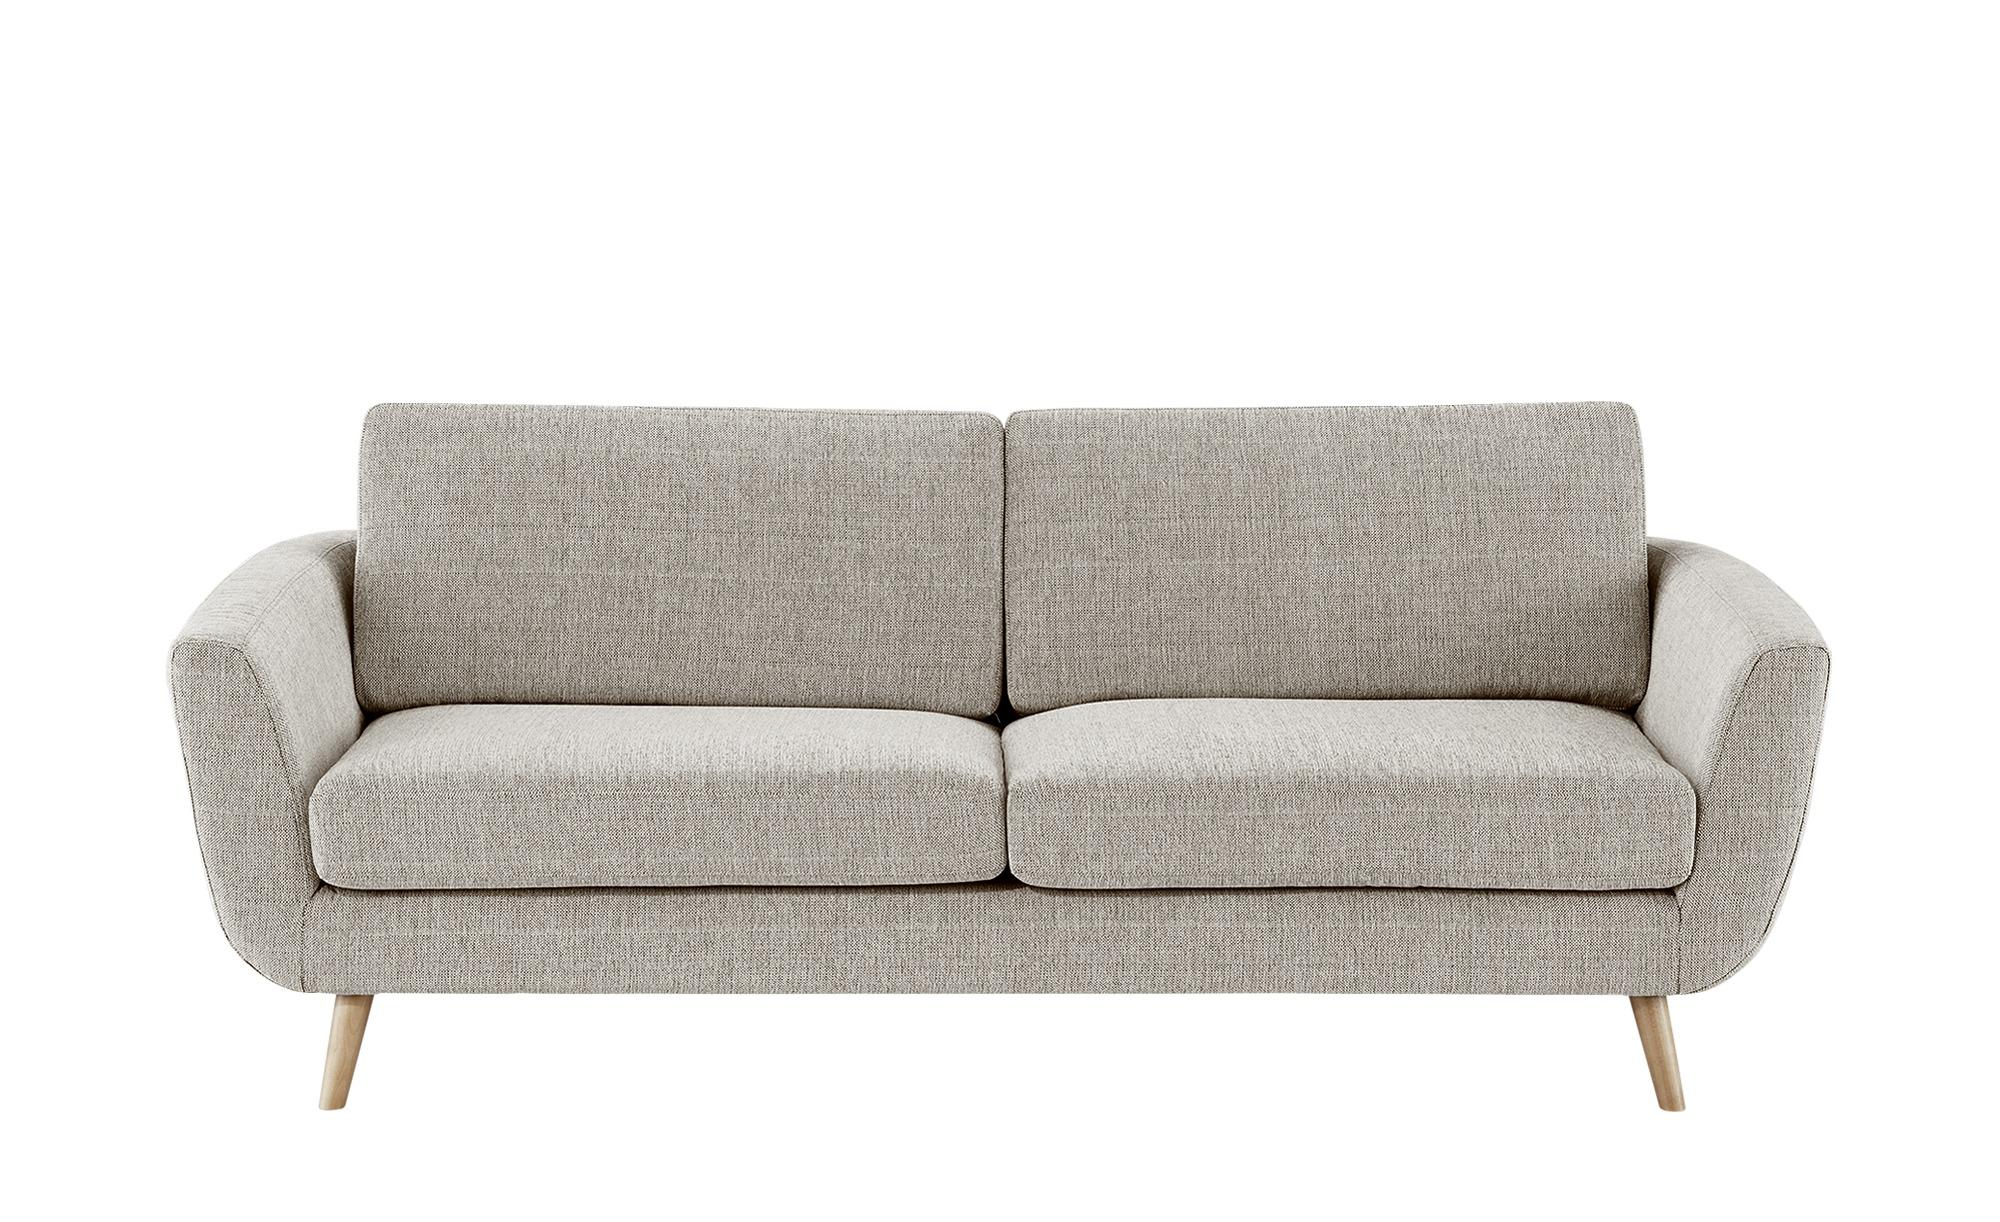 SOHO Sofa braun - Webstoff Smilla ¦ Maße (cm): B: 217 H: 85 T: 93 Polstermöbel > Sofas > 3-Sitzer - Höffner